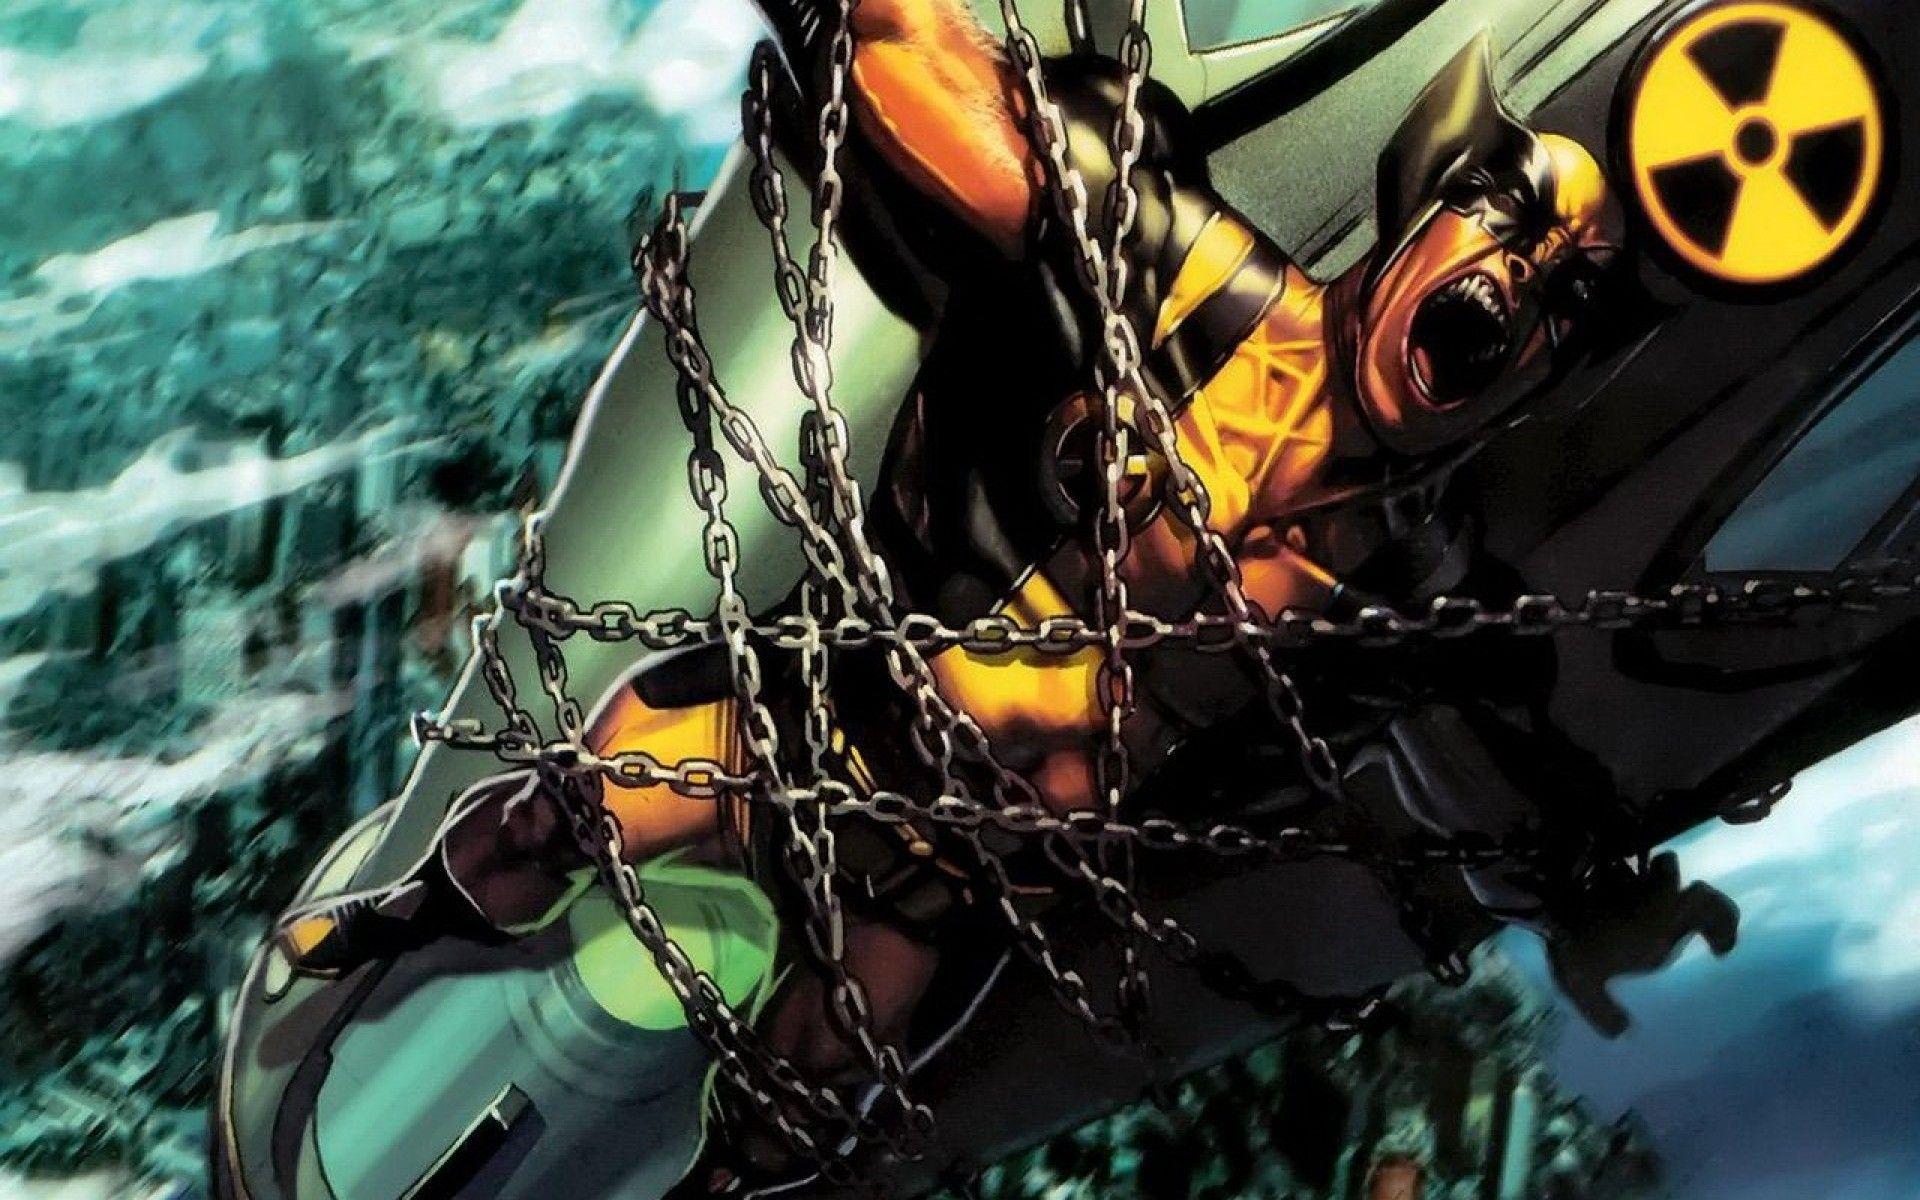 Hd wallpaper comic - Hd Wallpaper Wolverine Comic Wallpapers Wallpaper